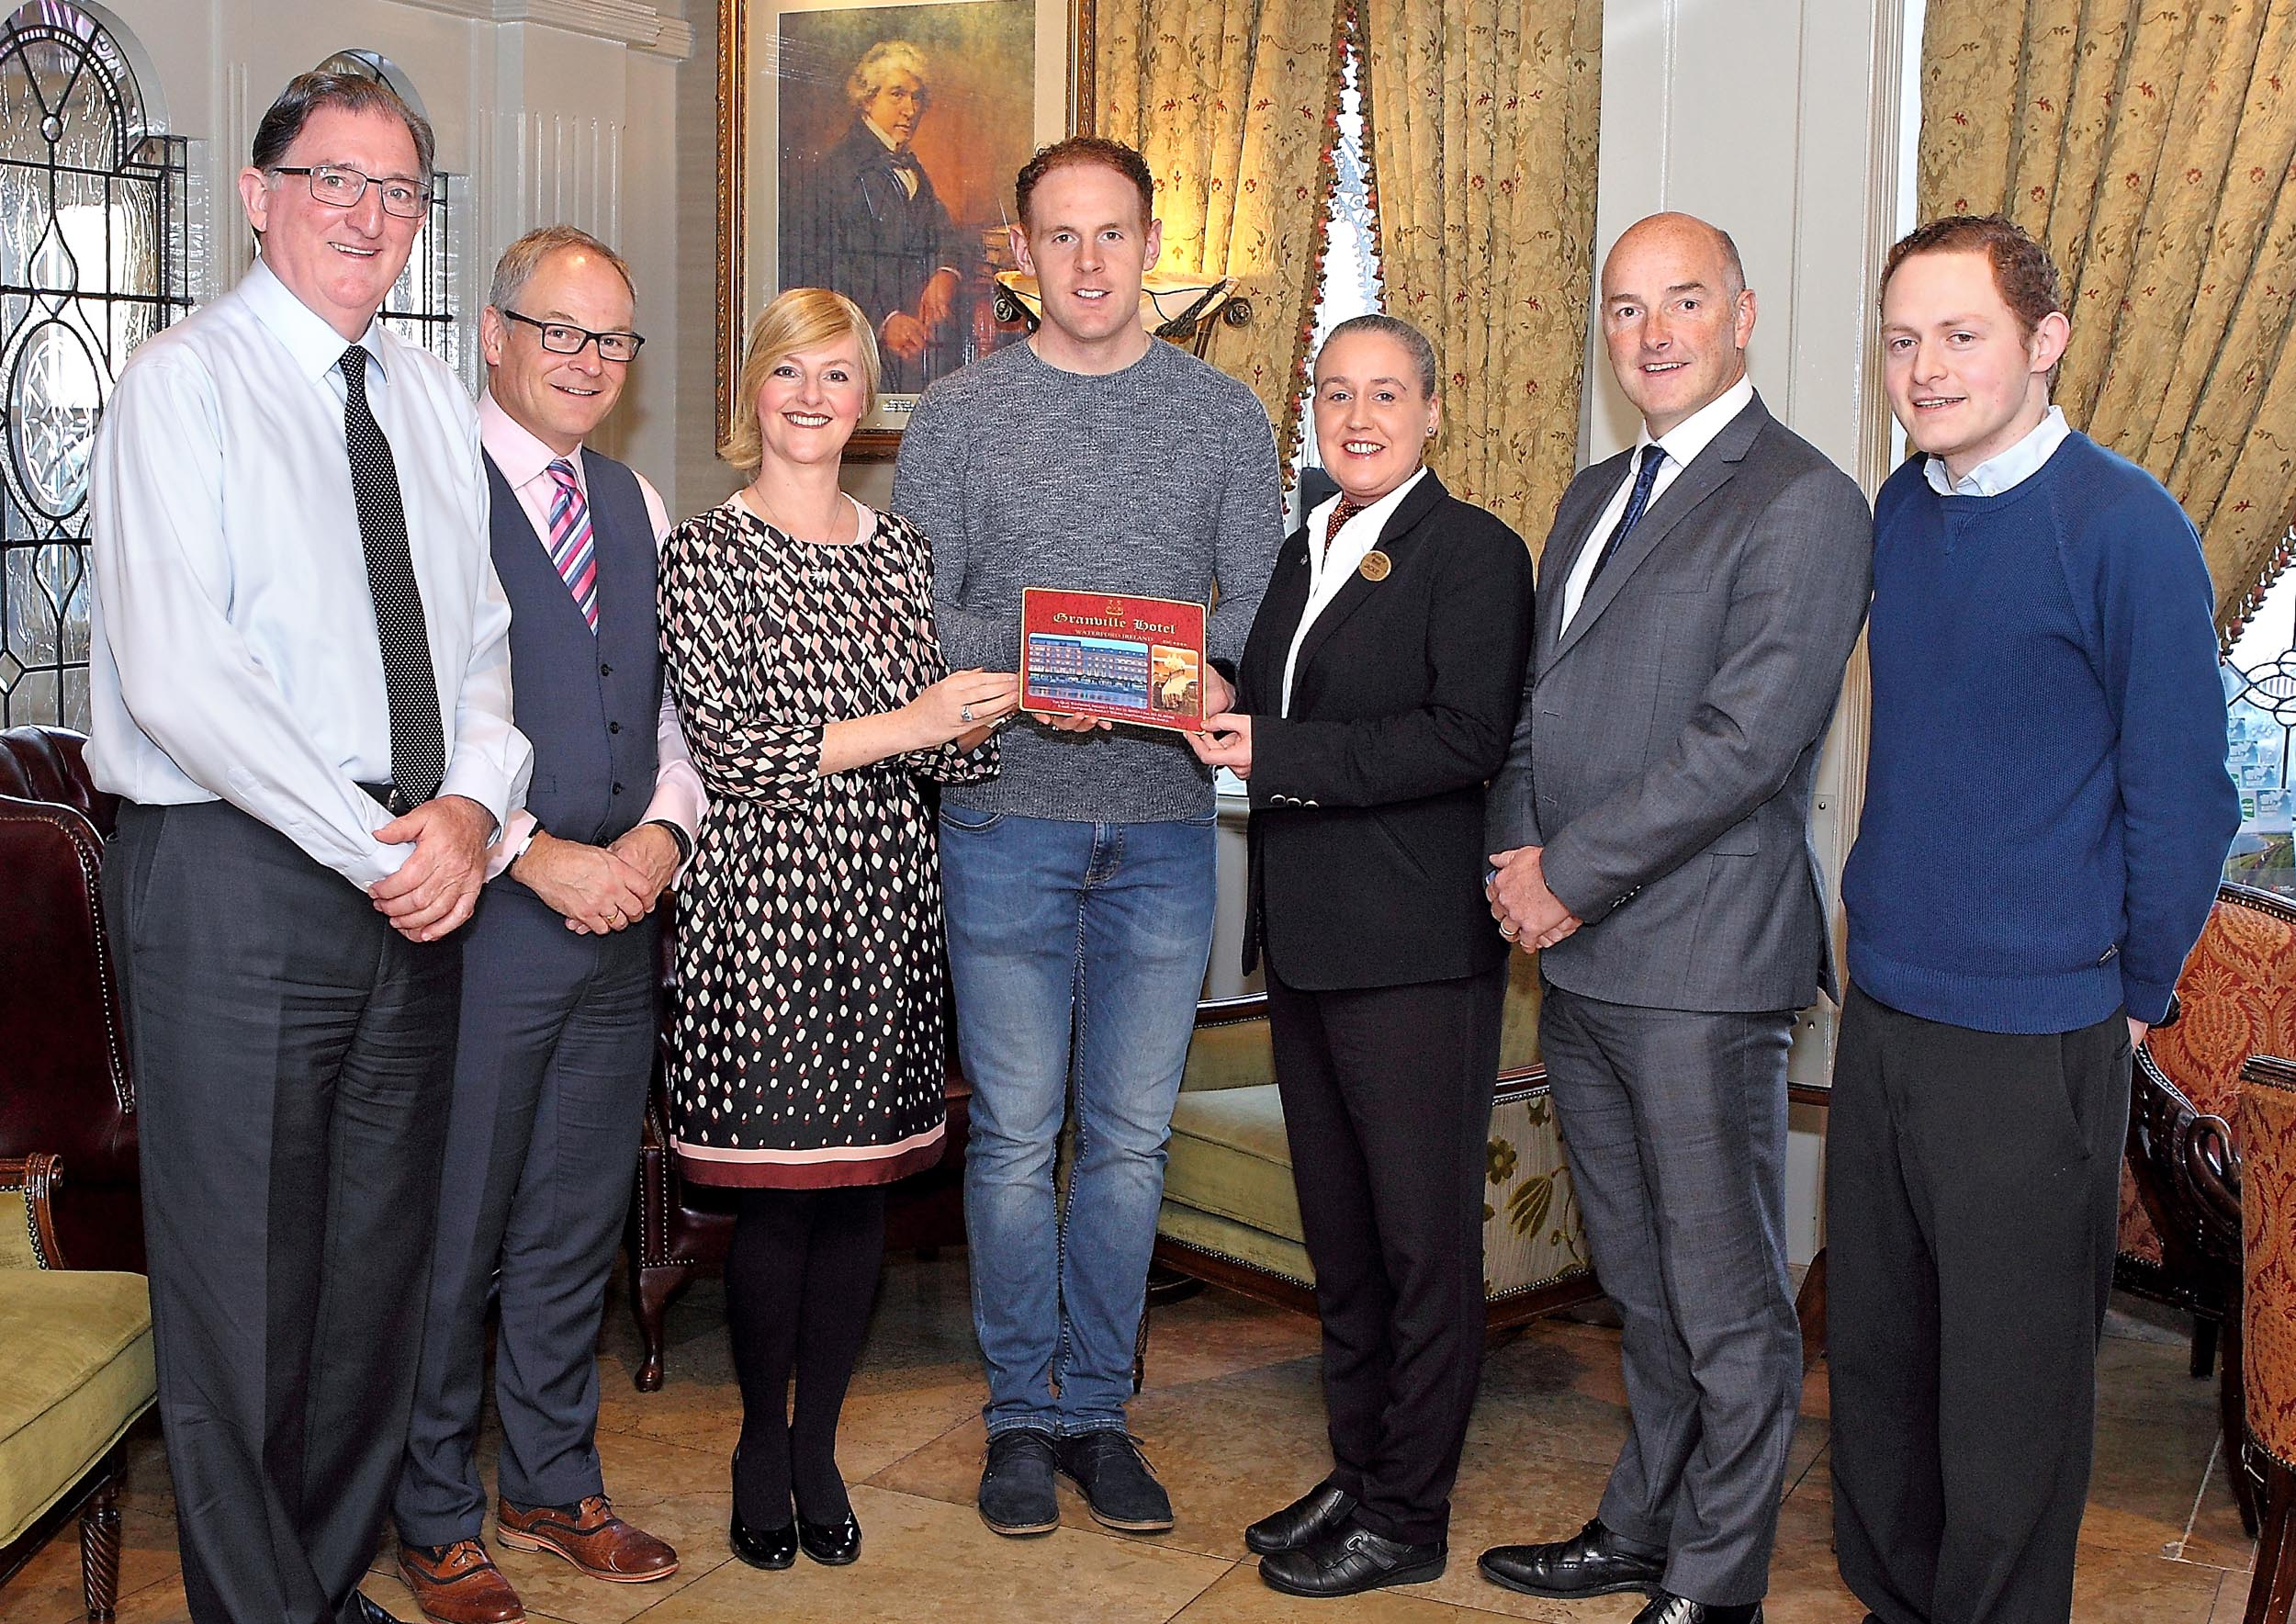 Kevin Moran is the September winner of the WLR / Granville GAA Award